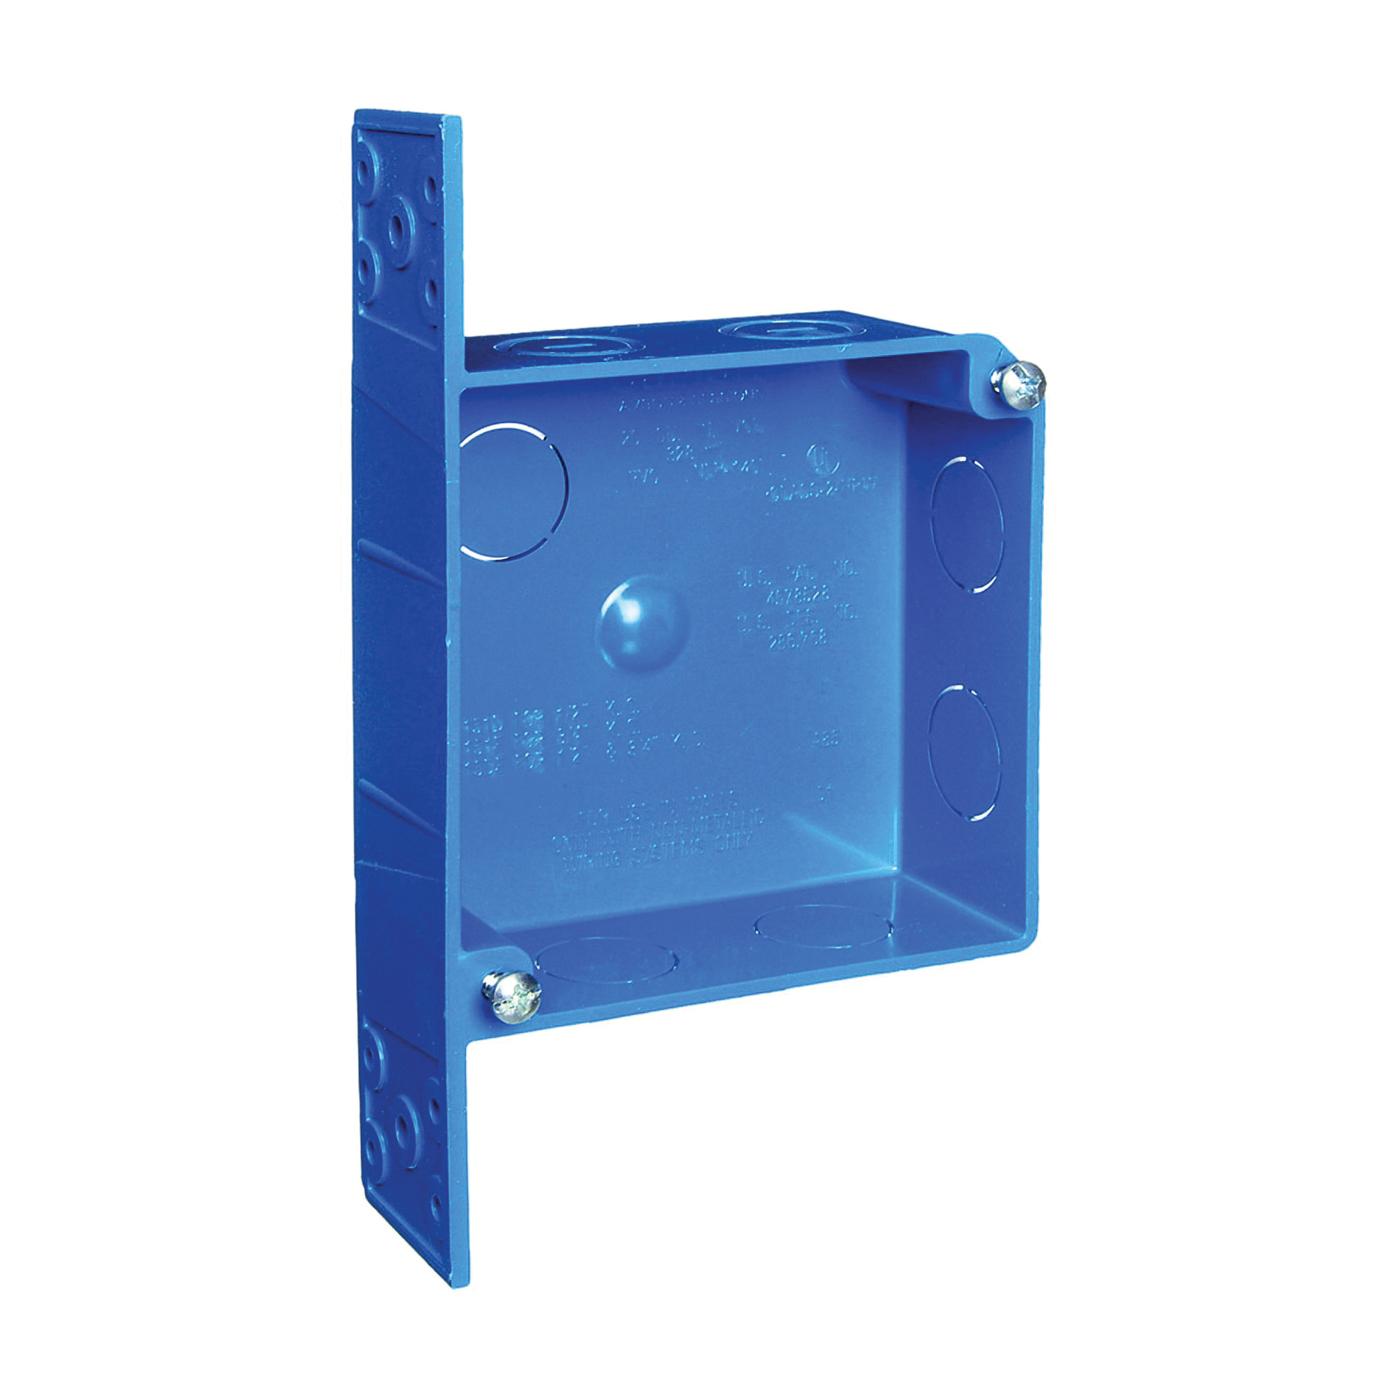 Picture of Carlon A521DE Outlet Box, 2-Gang, 7-Knockout, PVC, Blue, Bracket Mounting